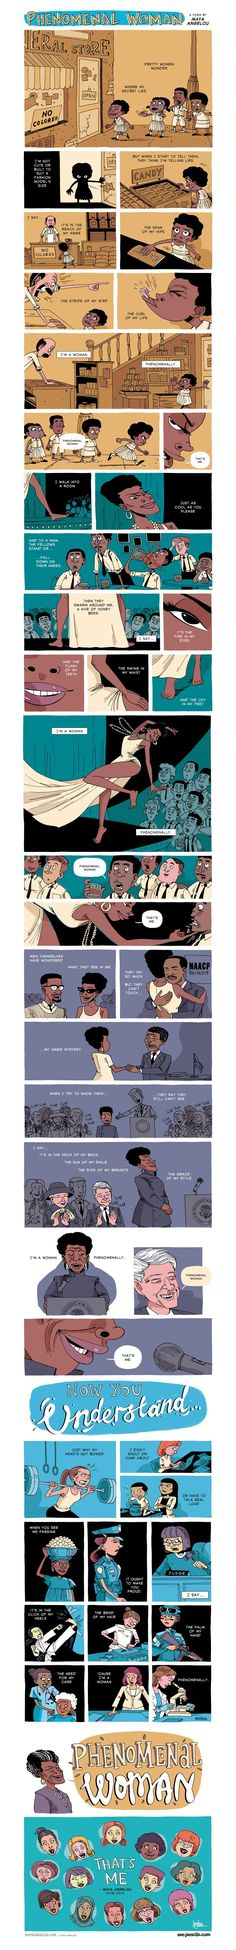 ZEN PENCILS » Cartoon quotes from inspirational folks